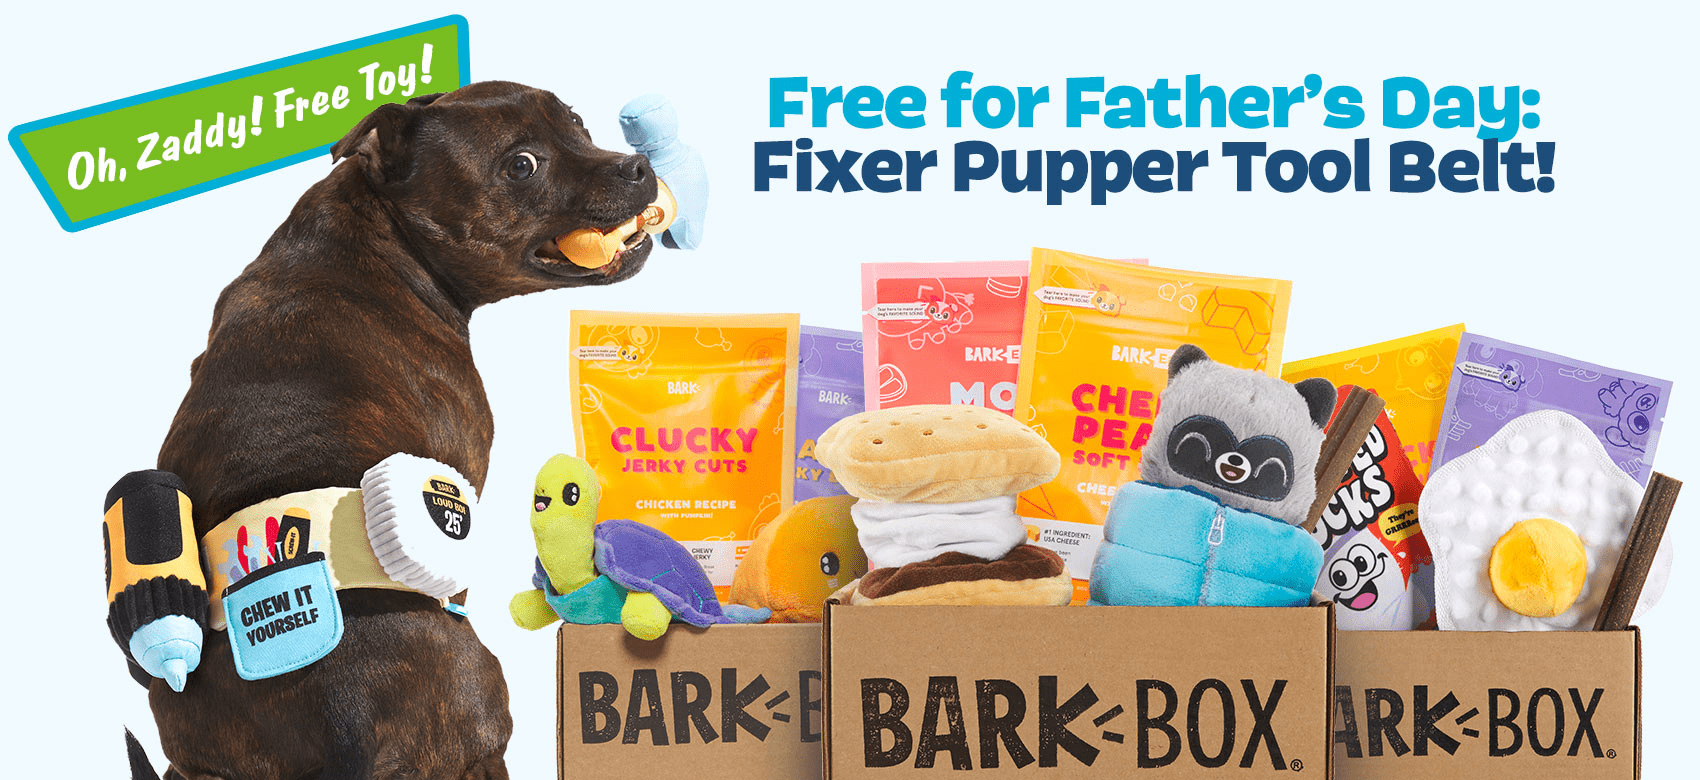 BarkBox Coupon Code – FREE Fixer Pupper Tool Belt Wearable!